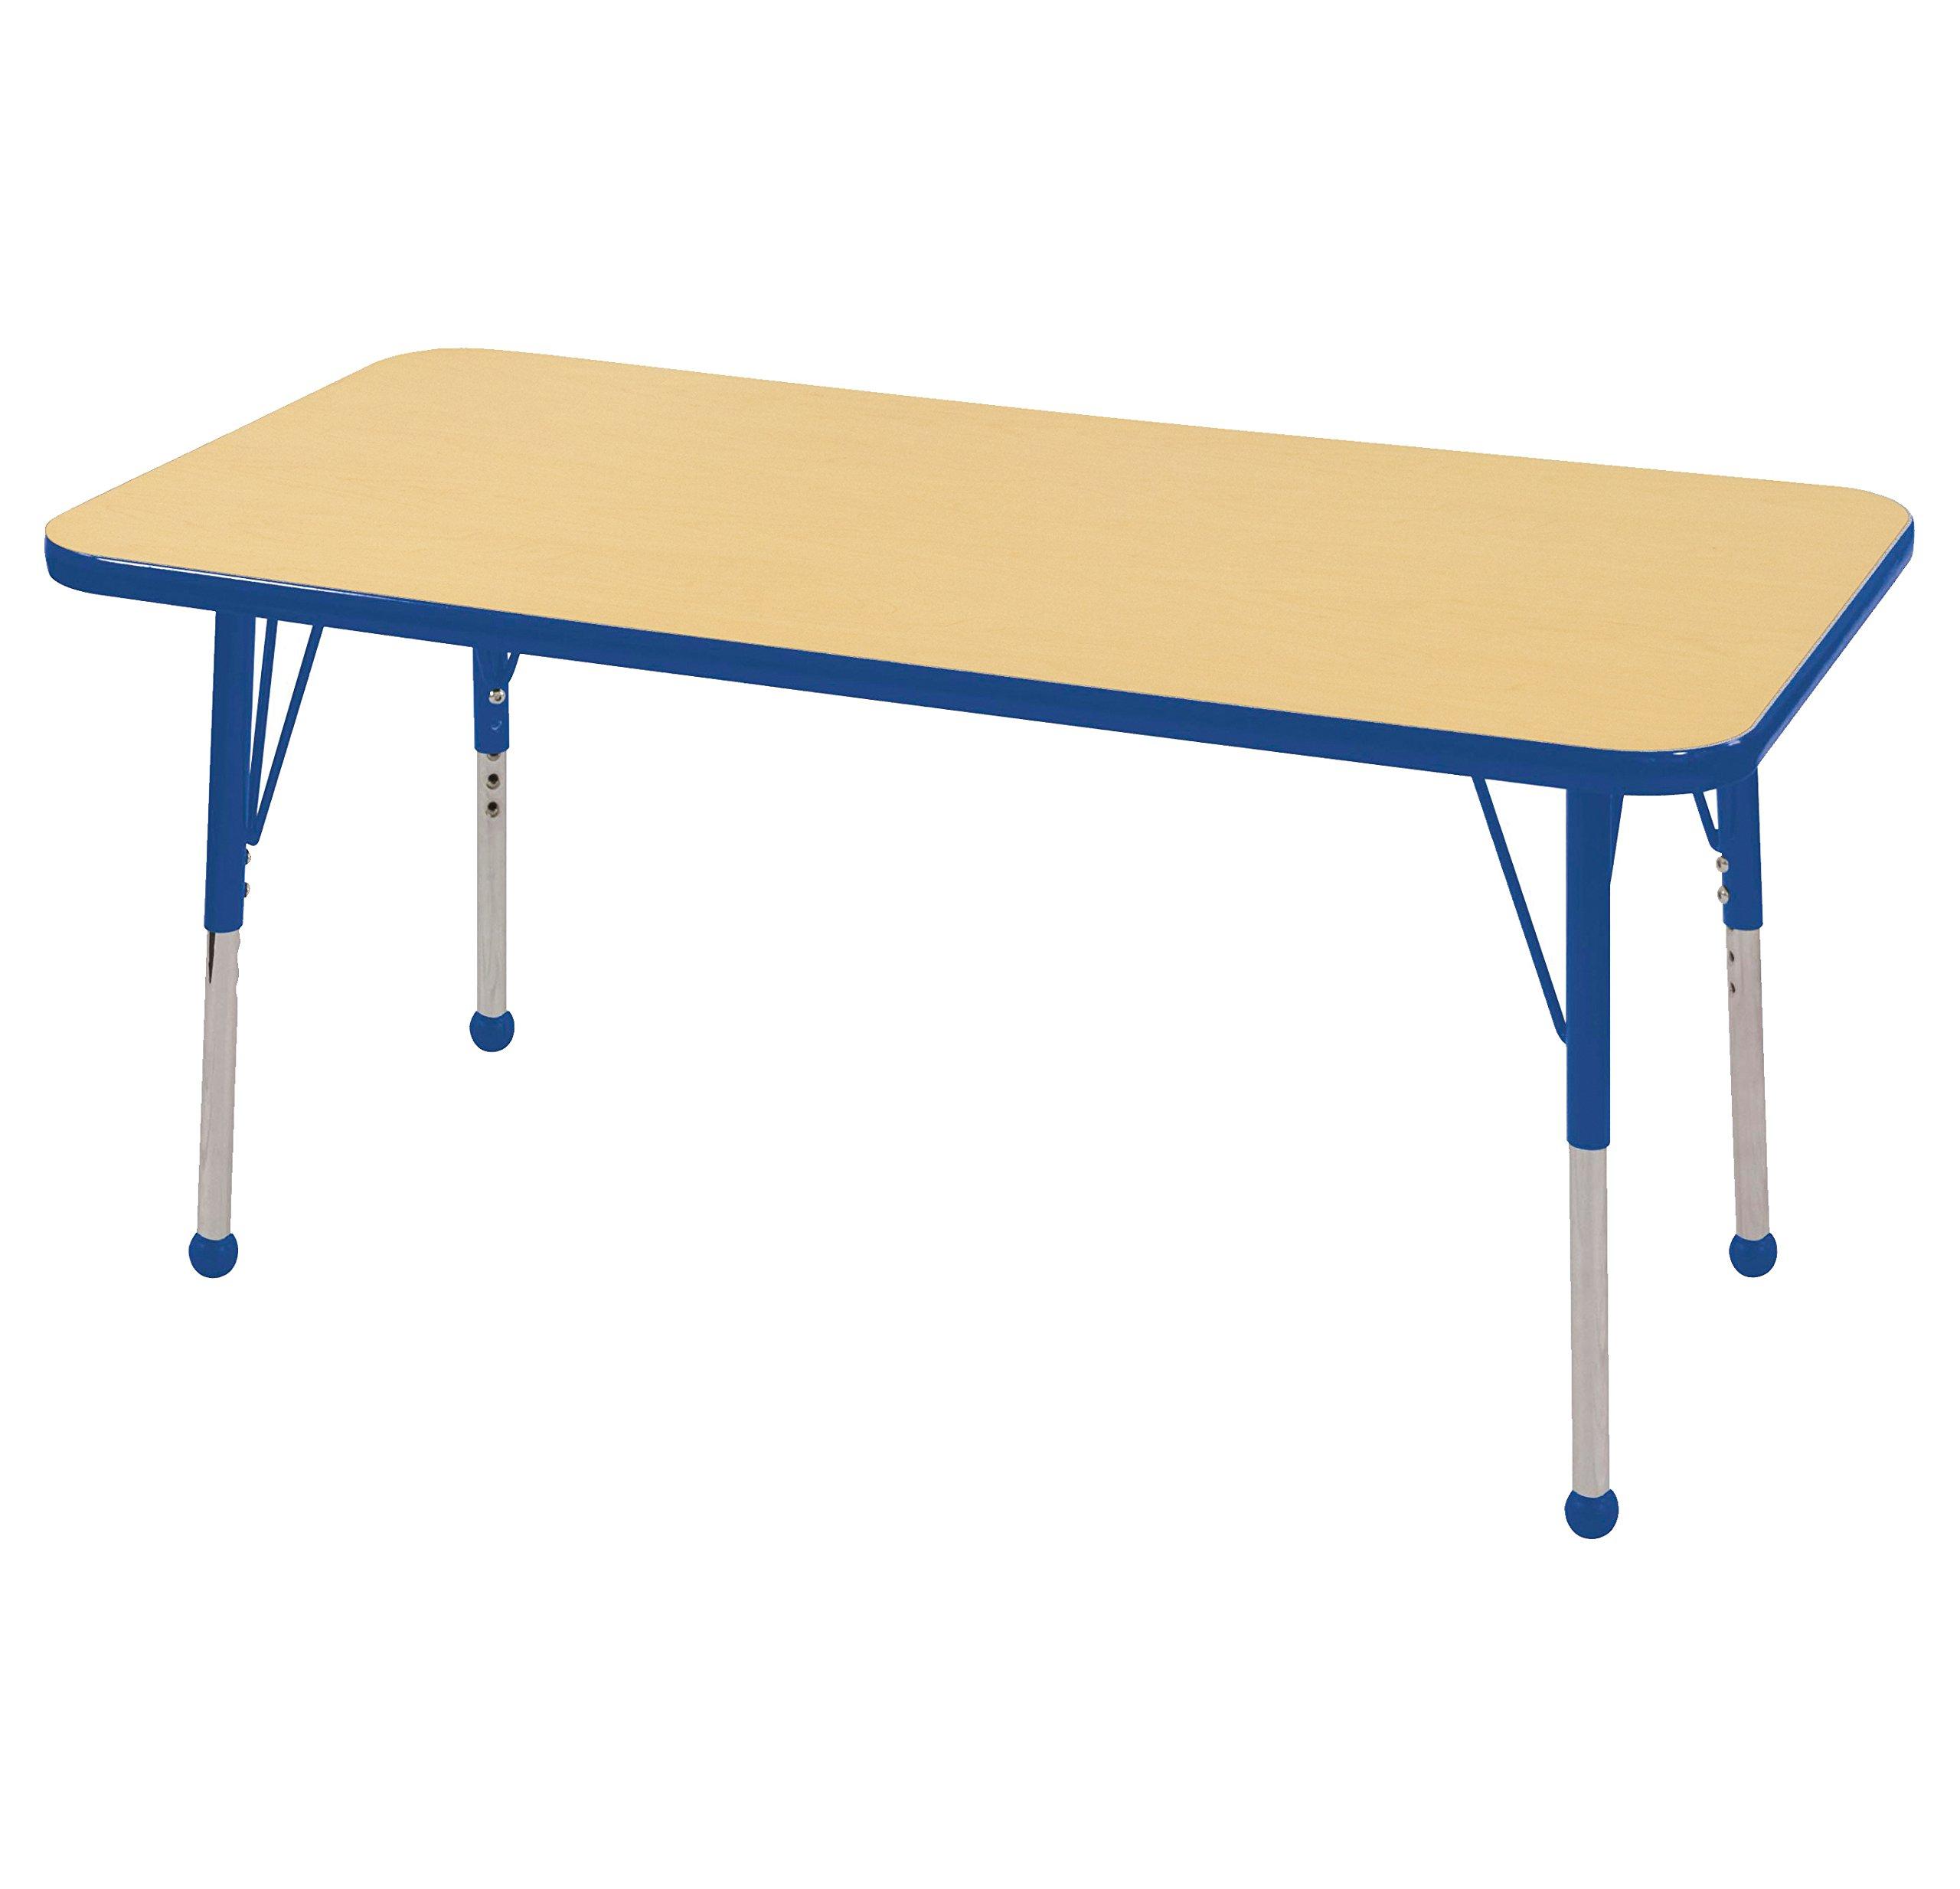 ECR4Kids Mesa T-Mold 24'' x 48'' Rectangular School Activity Table, Standard Legs w/ Ball Glides, Adjustable Height 19-30 inch (Maple/Blue)